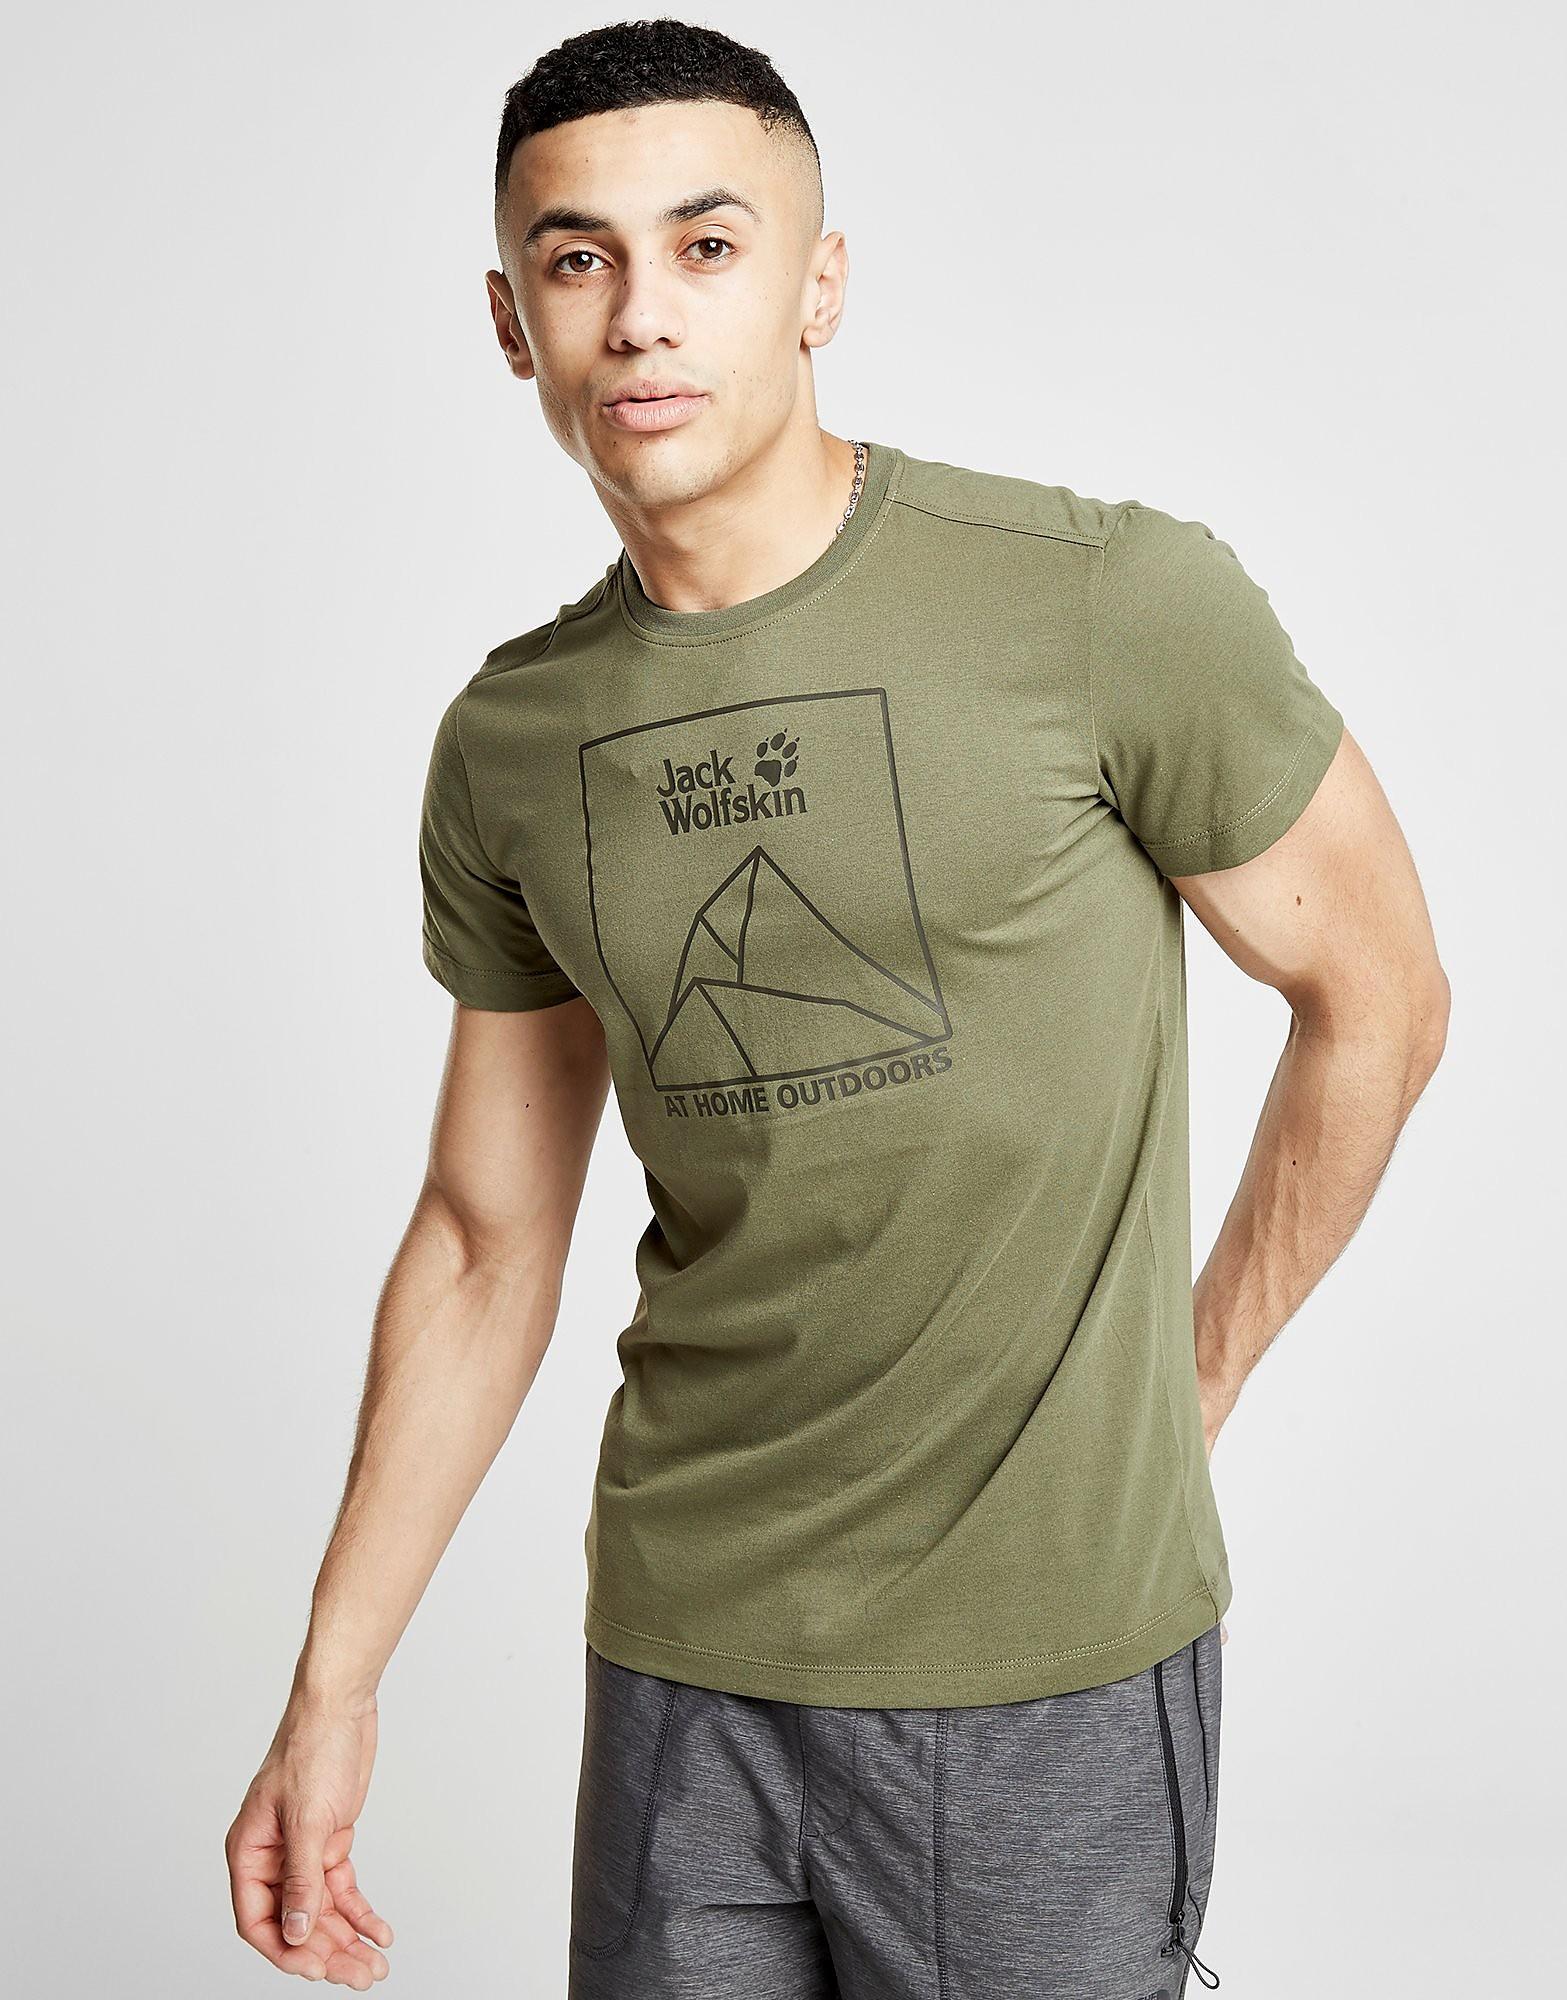 Jack Wolfskin Range Logo T-Shirt